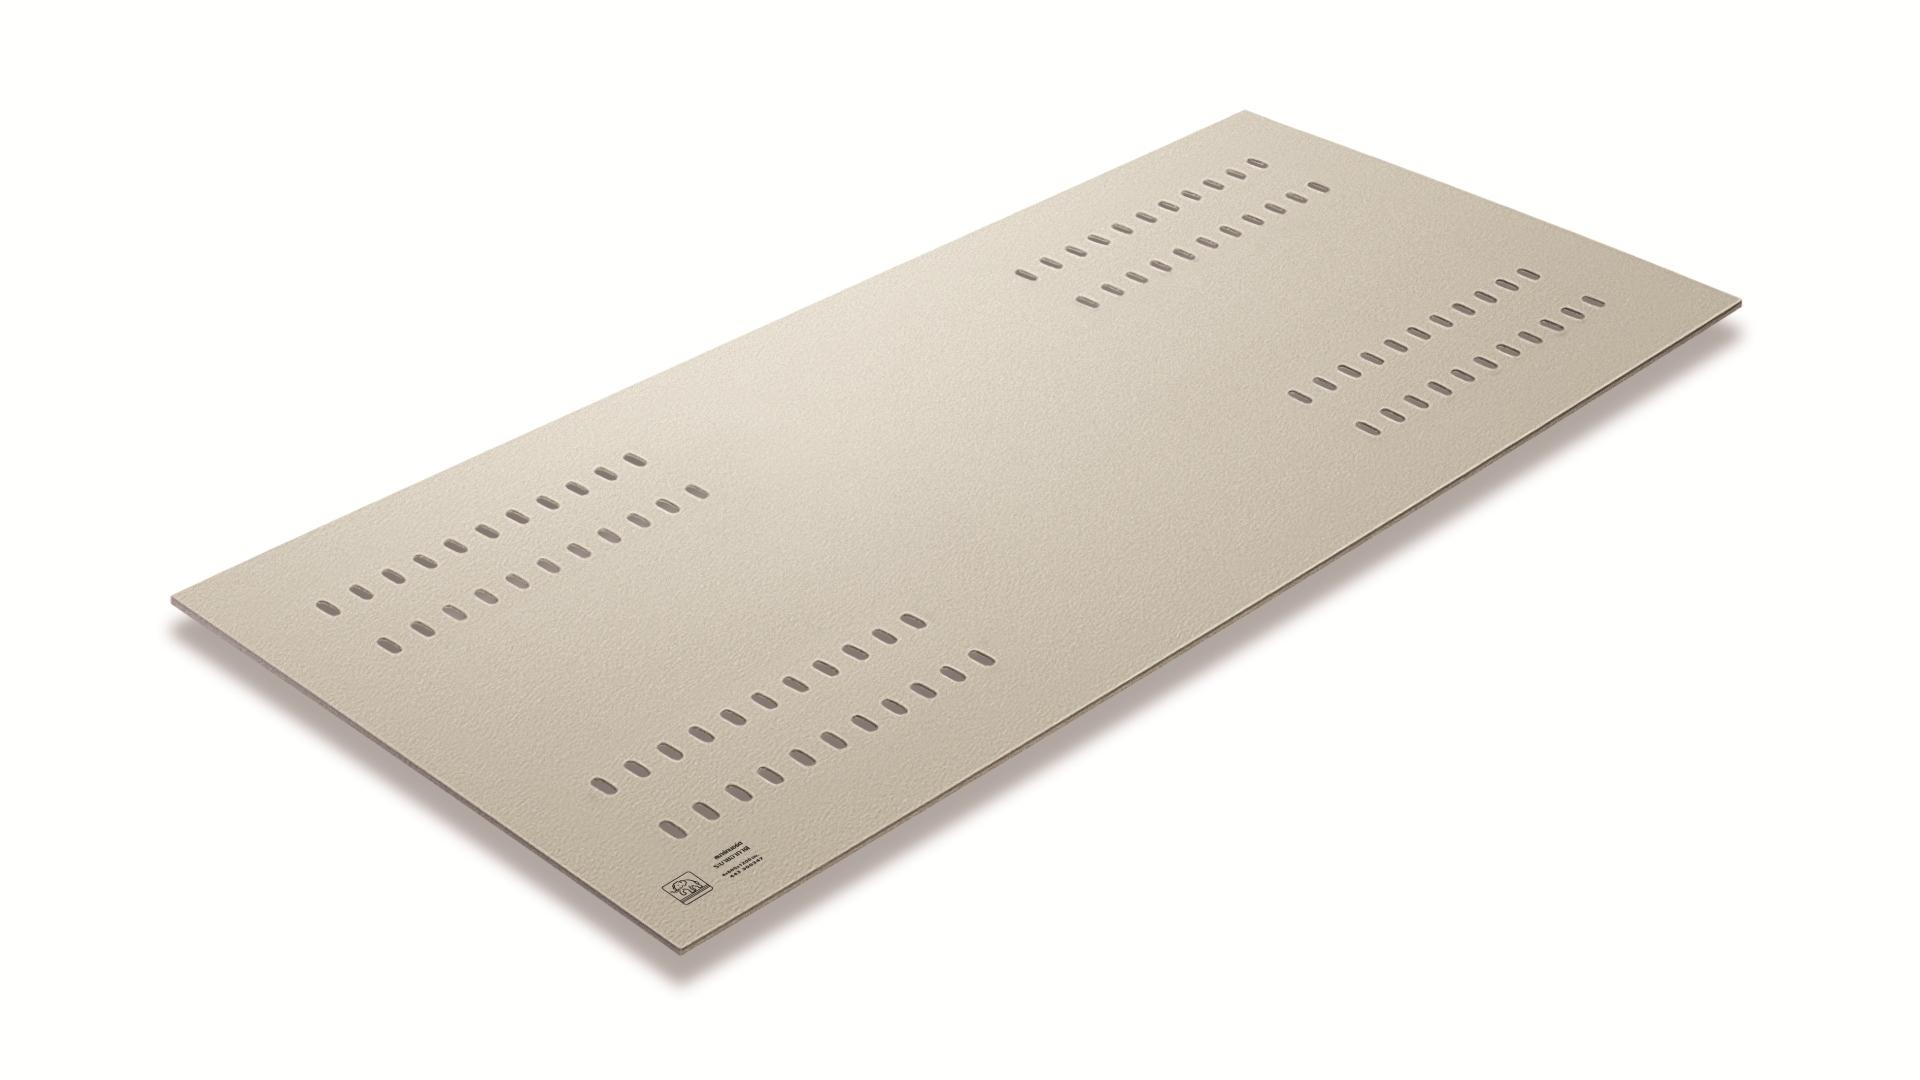 SCG Ventilated Ceiling Fiber Cement Board